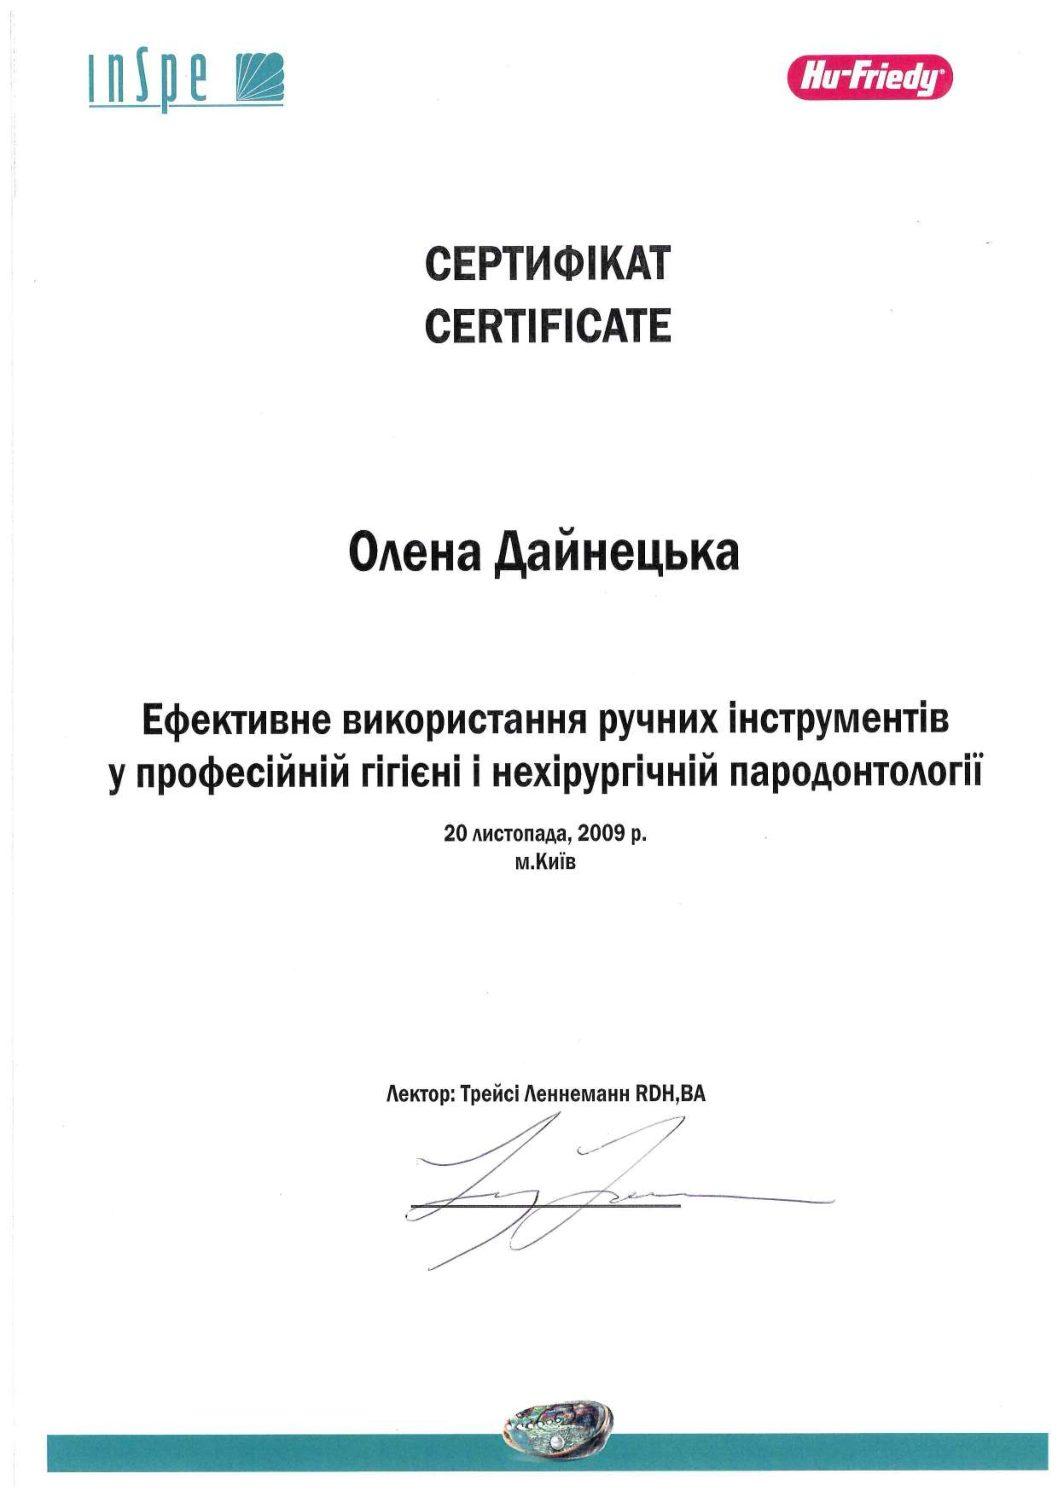 Untitled.FR27.tif compressed pdf - Олена Дайнецька